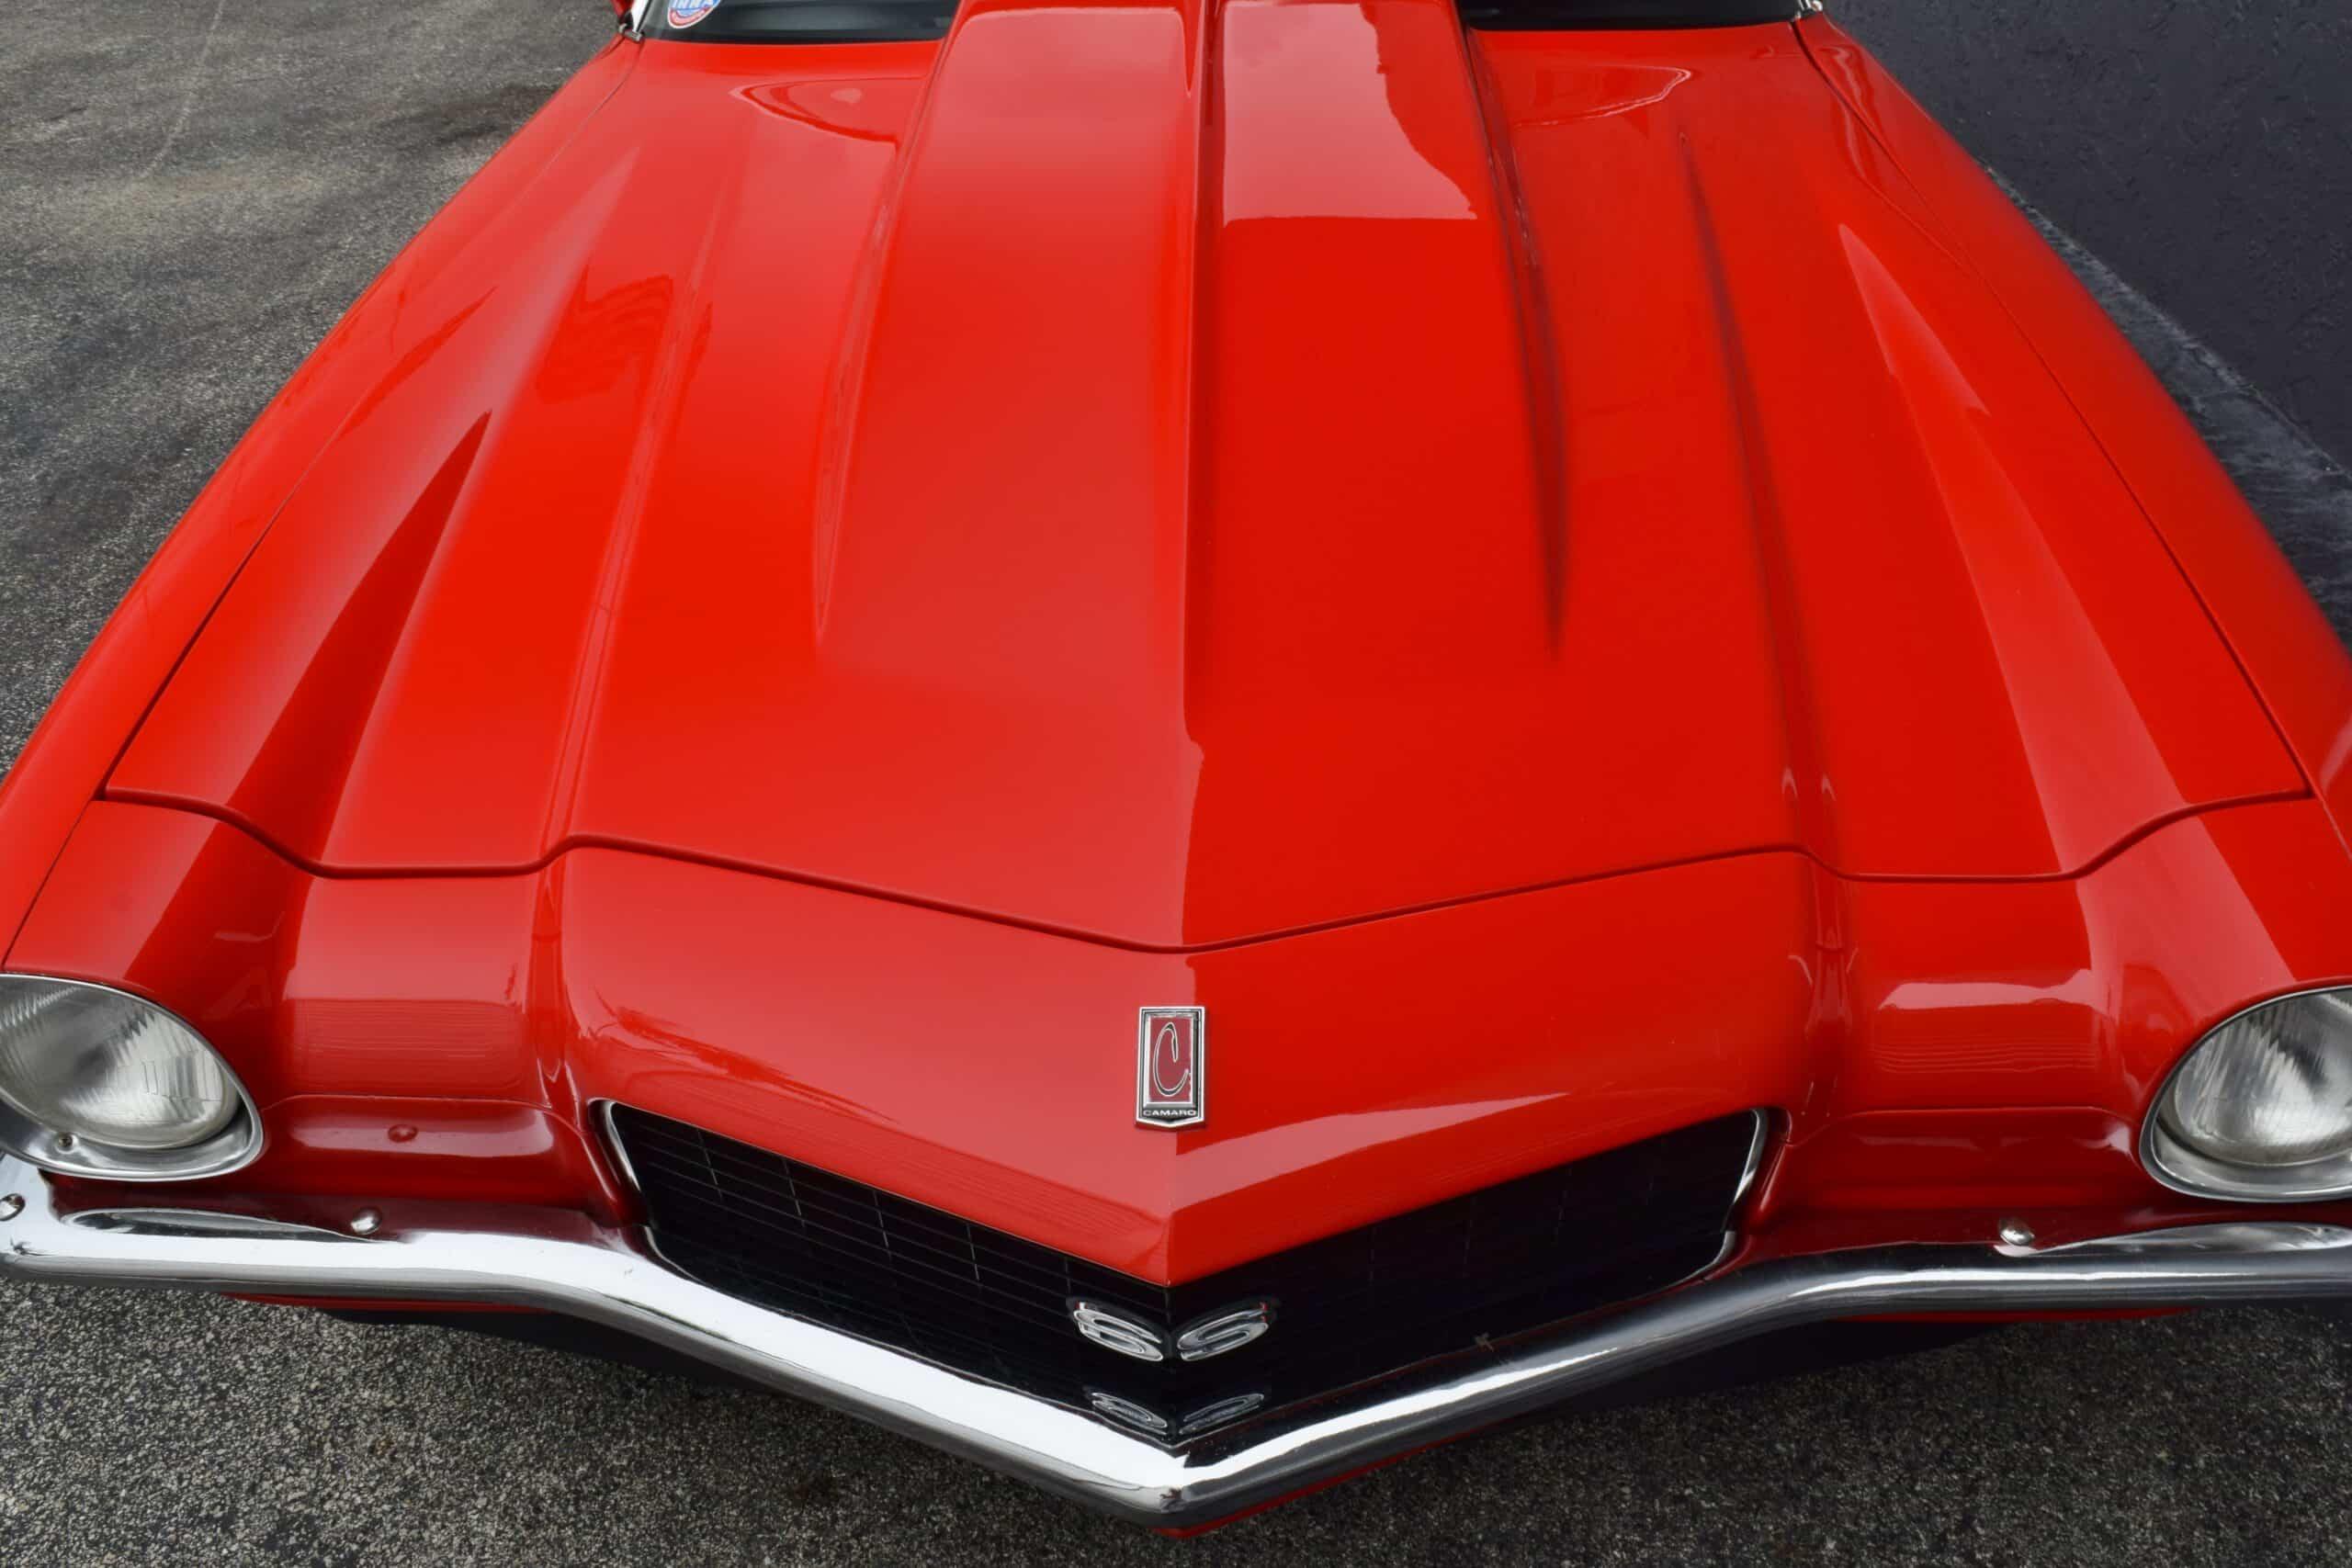 1971 Chevrolet Camaro REAL SS 421 CI SMALL BLOCK  (EXPORT) ASSEMBLY SUPER RARE 800 HP STREET CAR- TURBO 400 TRANS